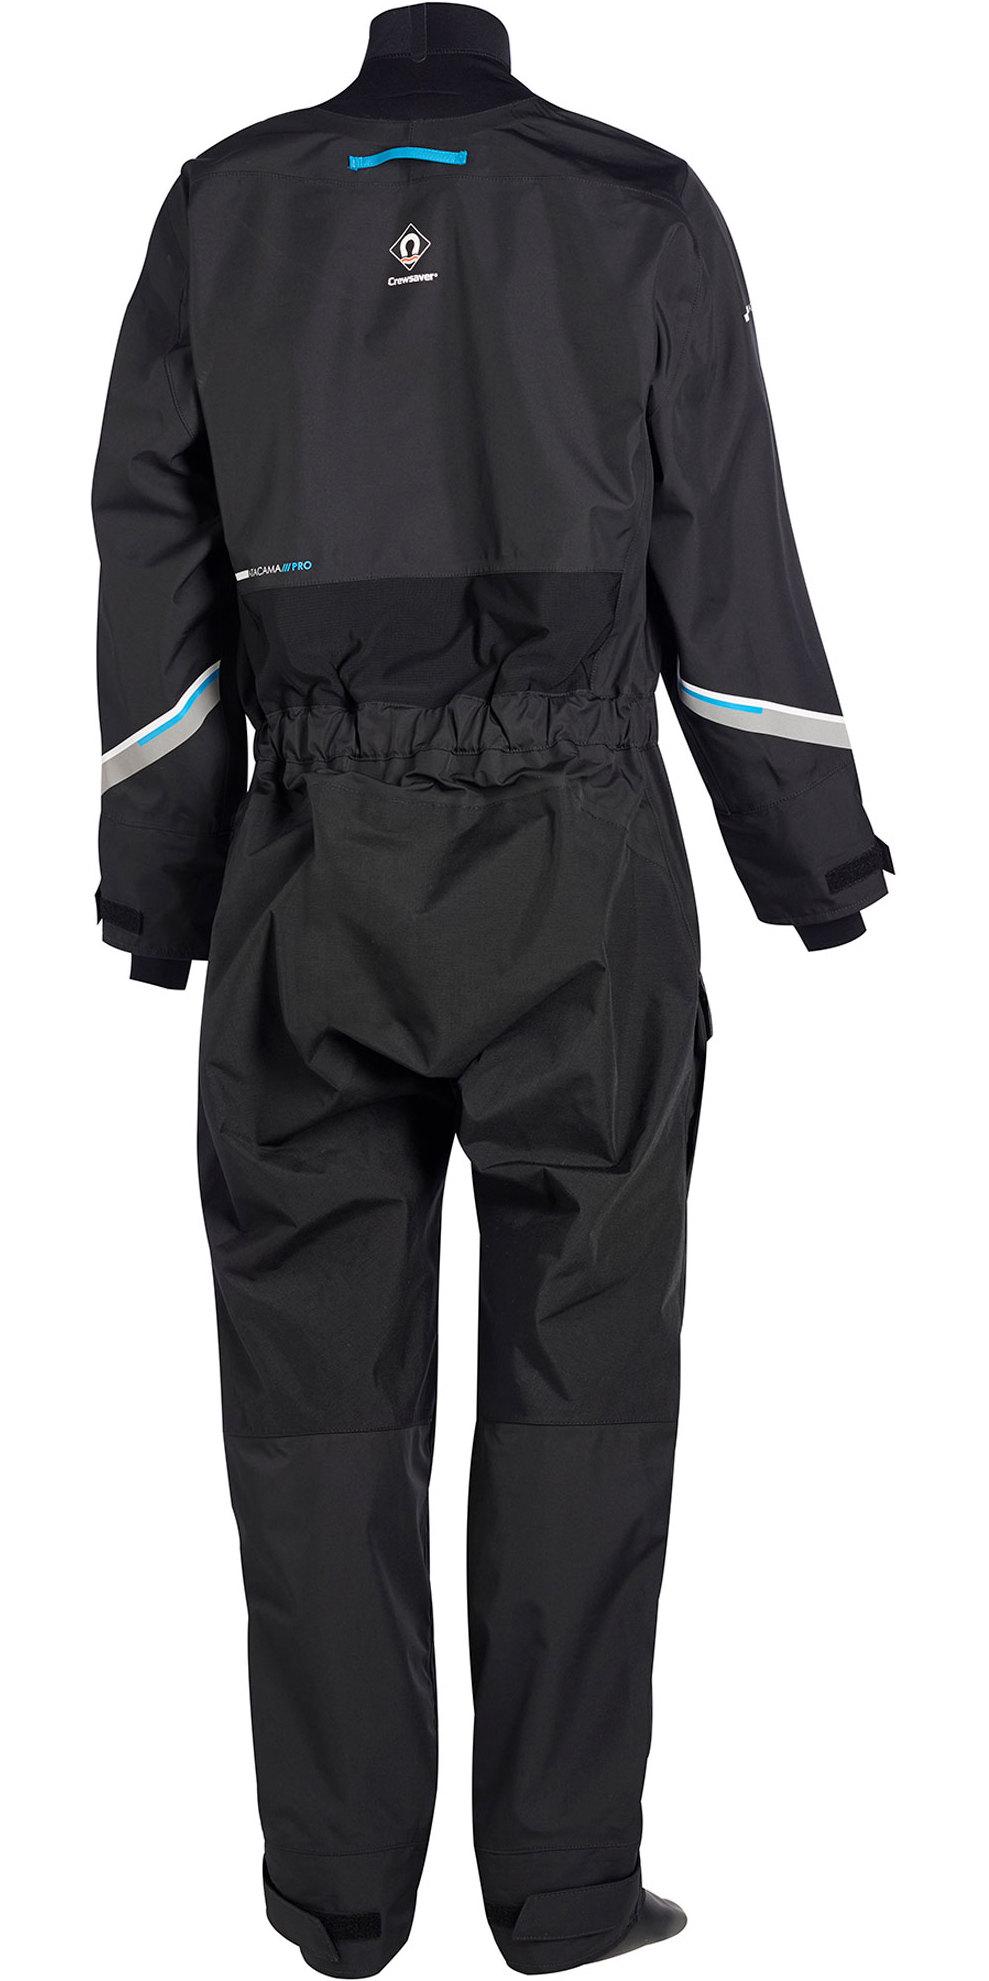 2020 Crewsaver Junior Atacama Pro Drysuit Incluyendo Ropa Interior Negro 6556j